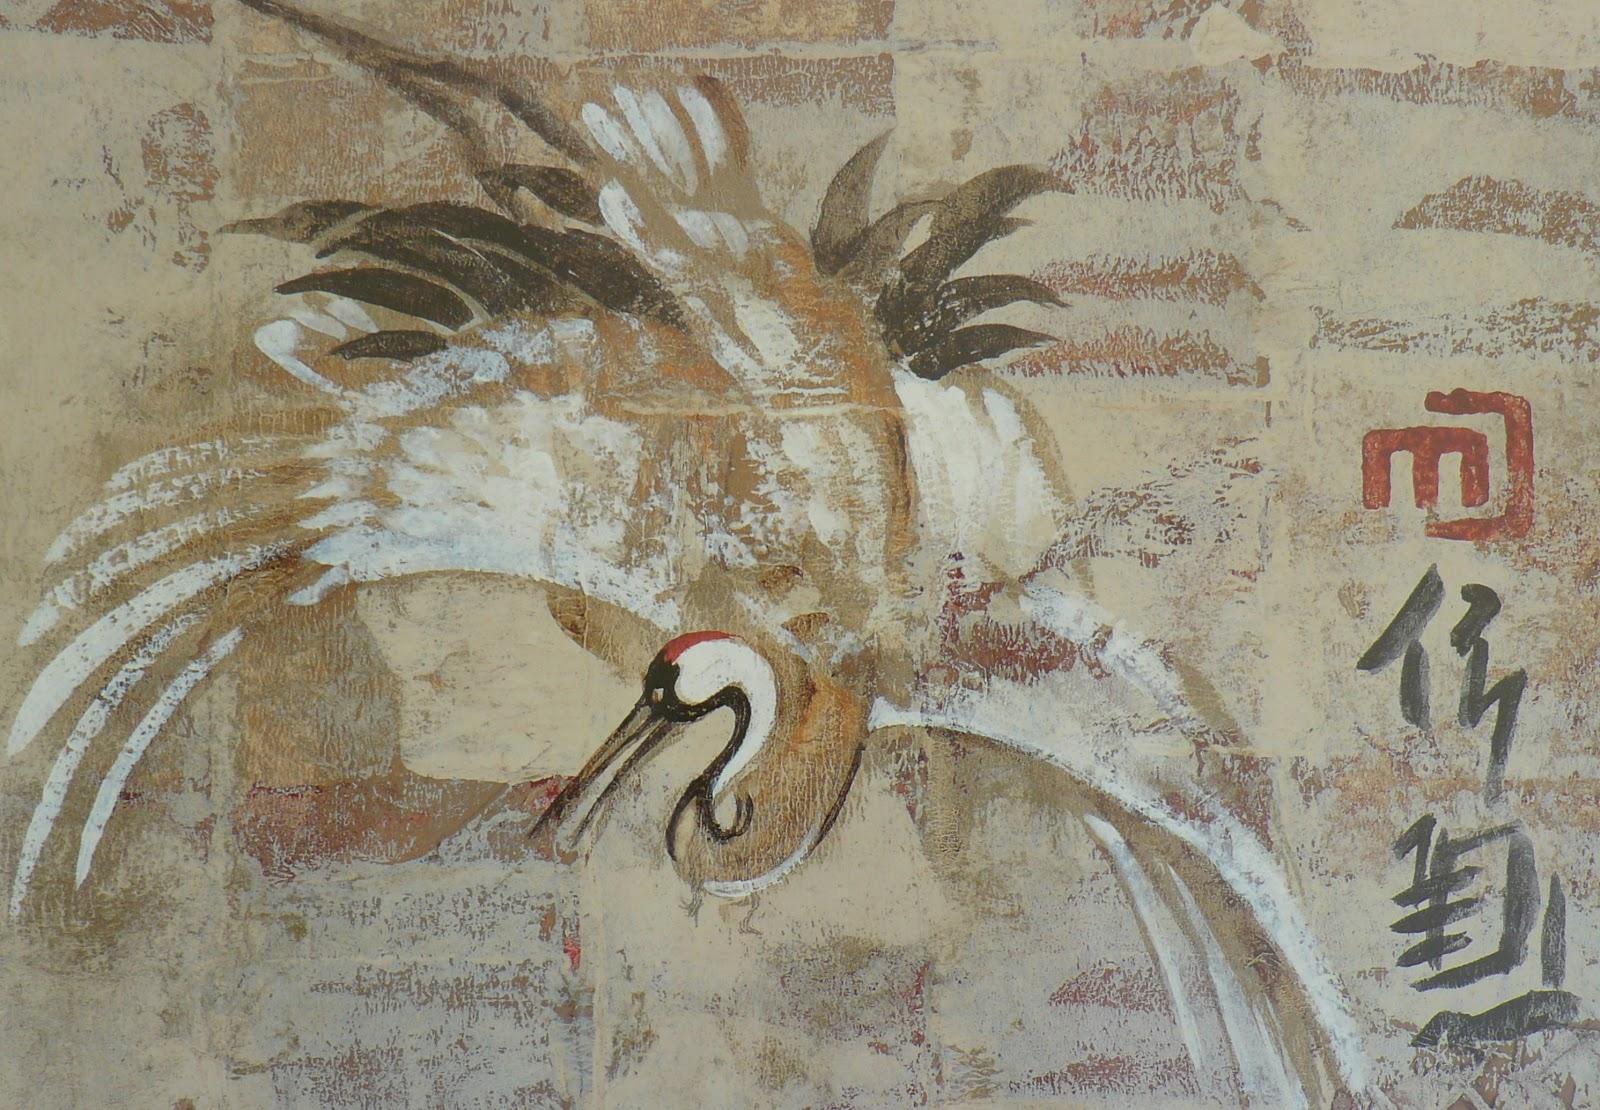 Feng Shui 8 Mansions: SYMBOLISM OF THE CRANE BIRD